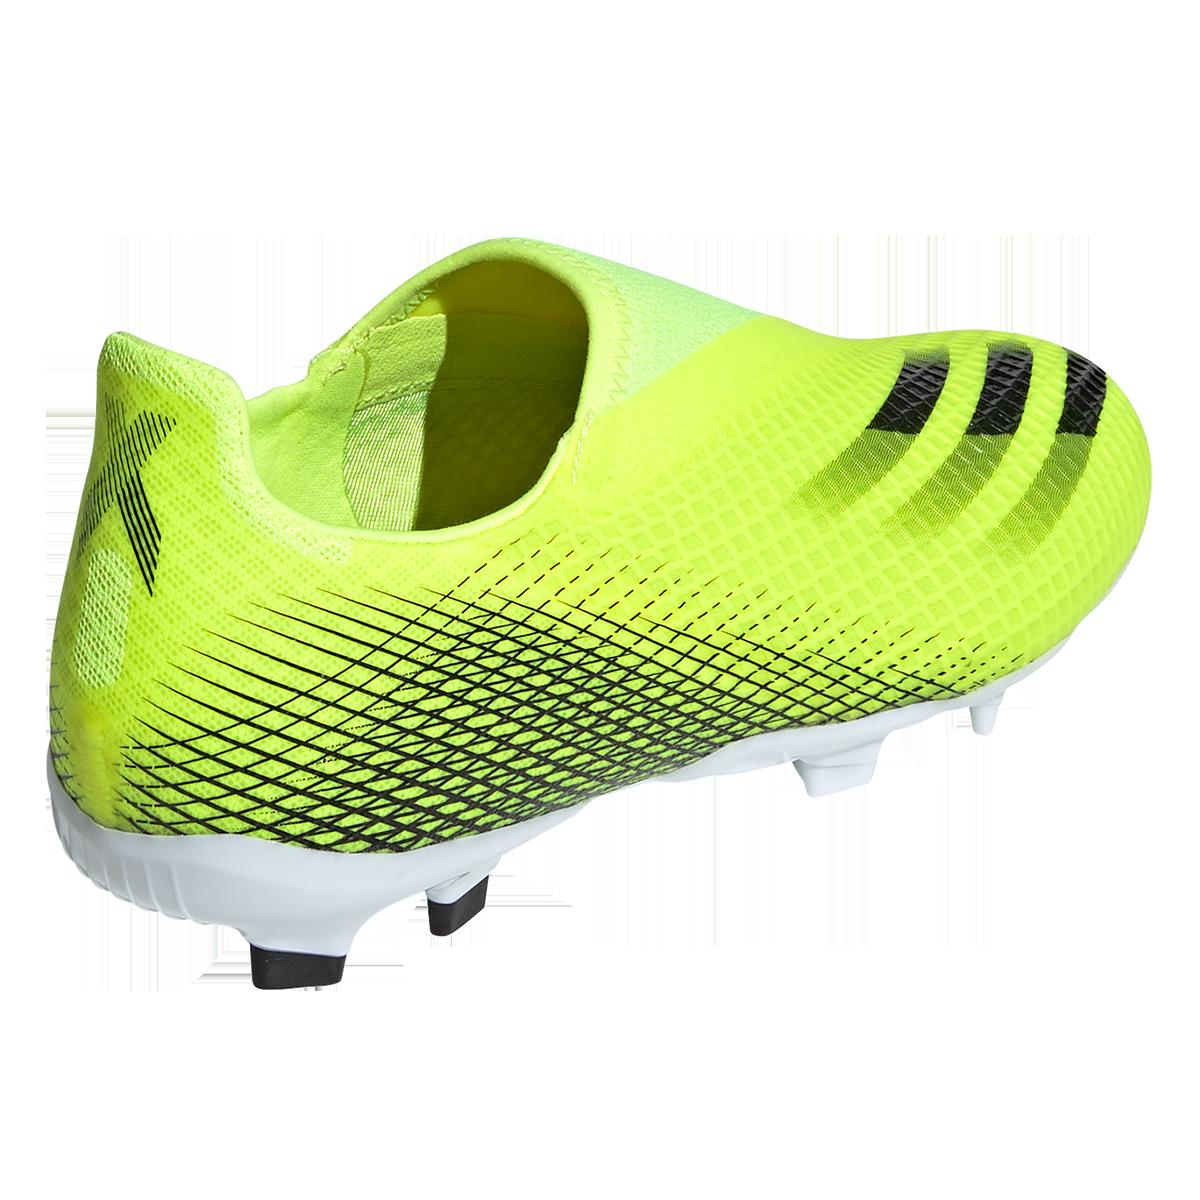 adidas chaussure de football enfant X Ghosted.3 FG LL jaune fluo ...